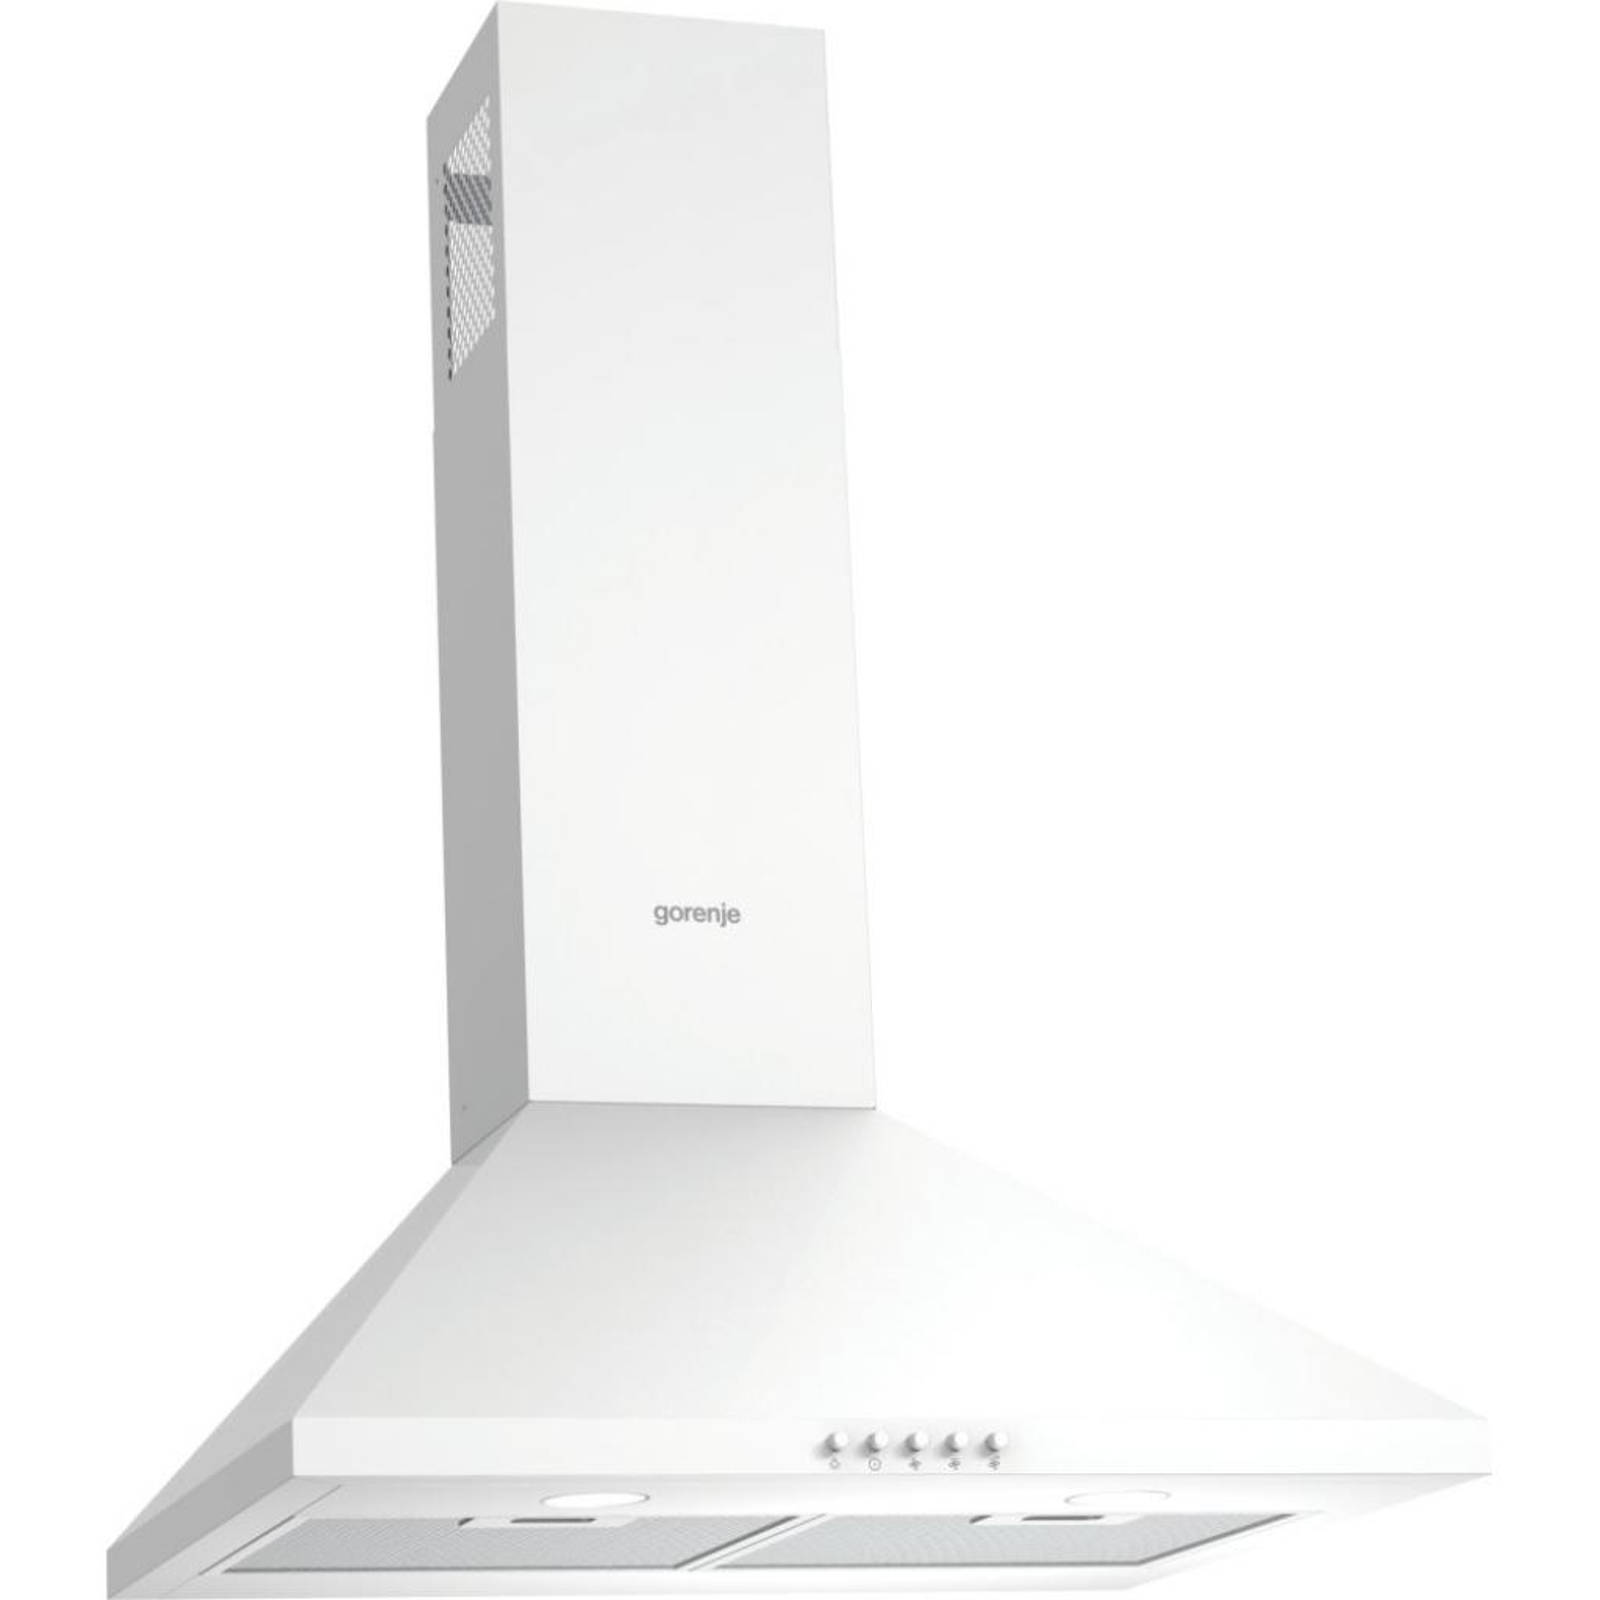 Вытяжка кухонная Gorenje WHC 623 E16W